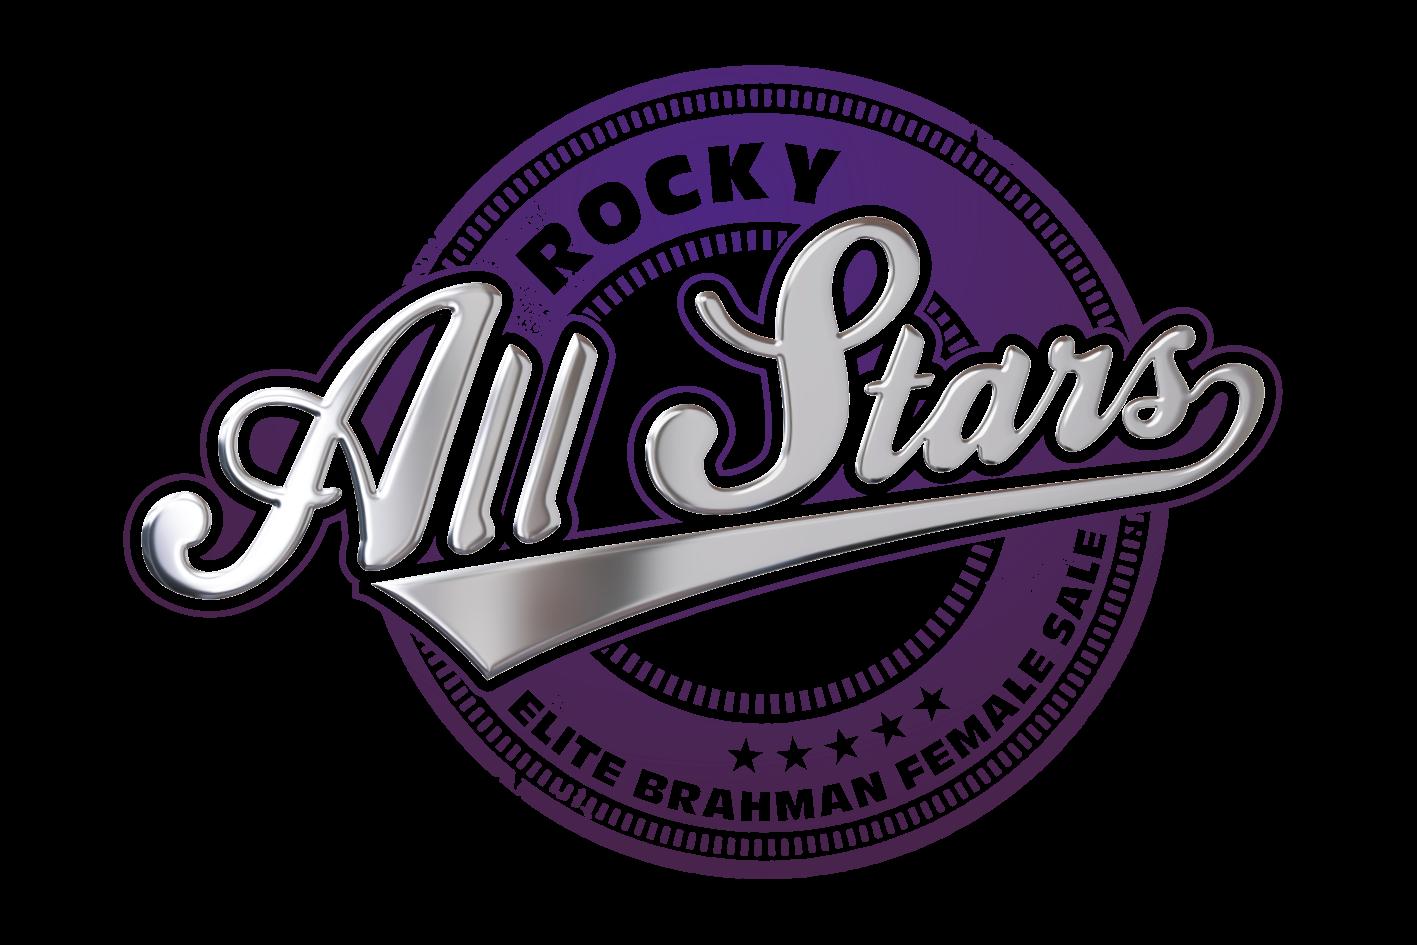 Rocky All Stars Elite Brahman Female Sale